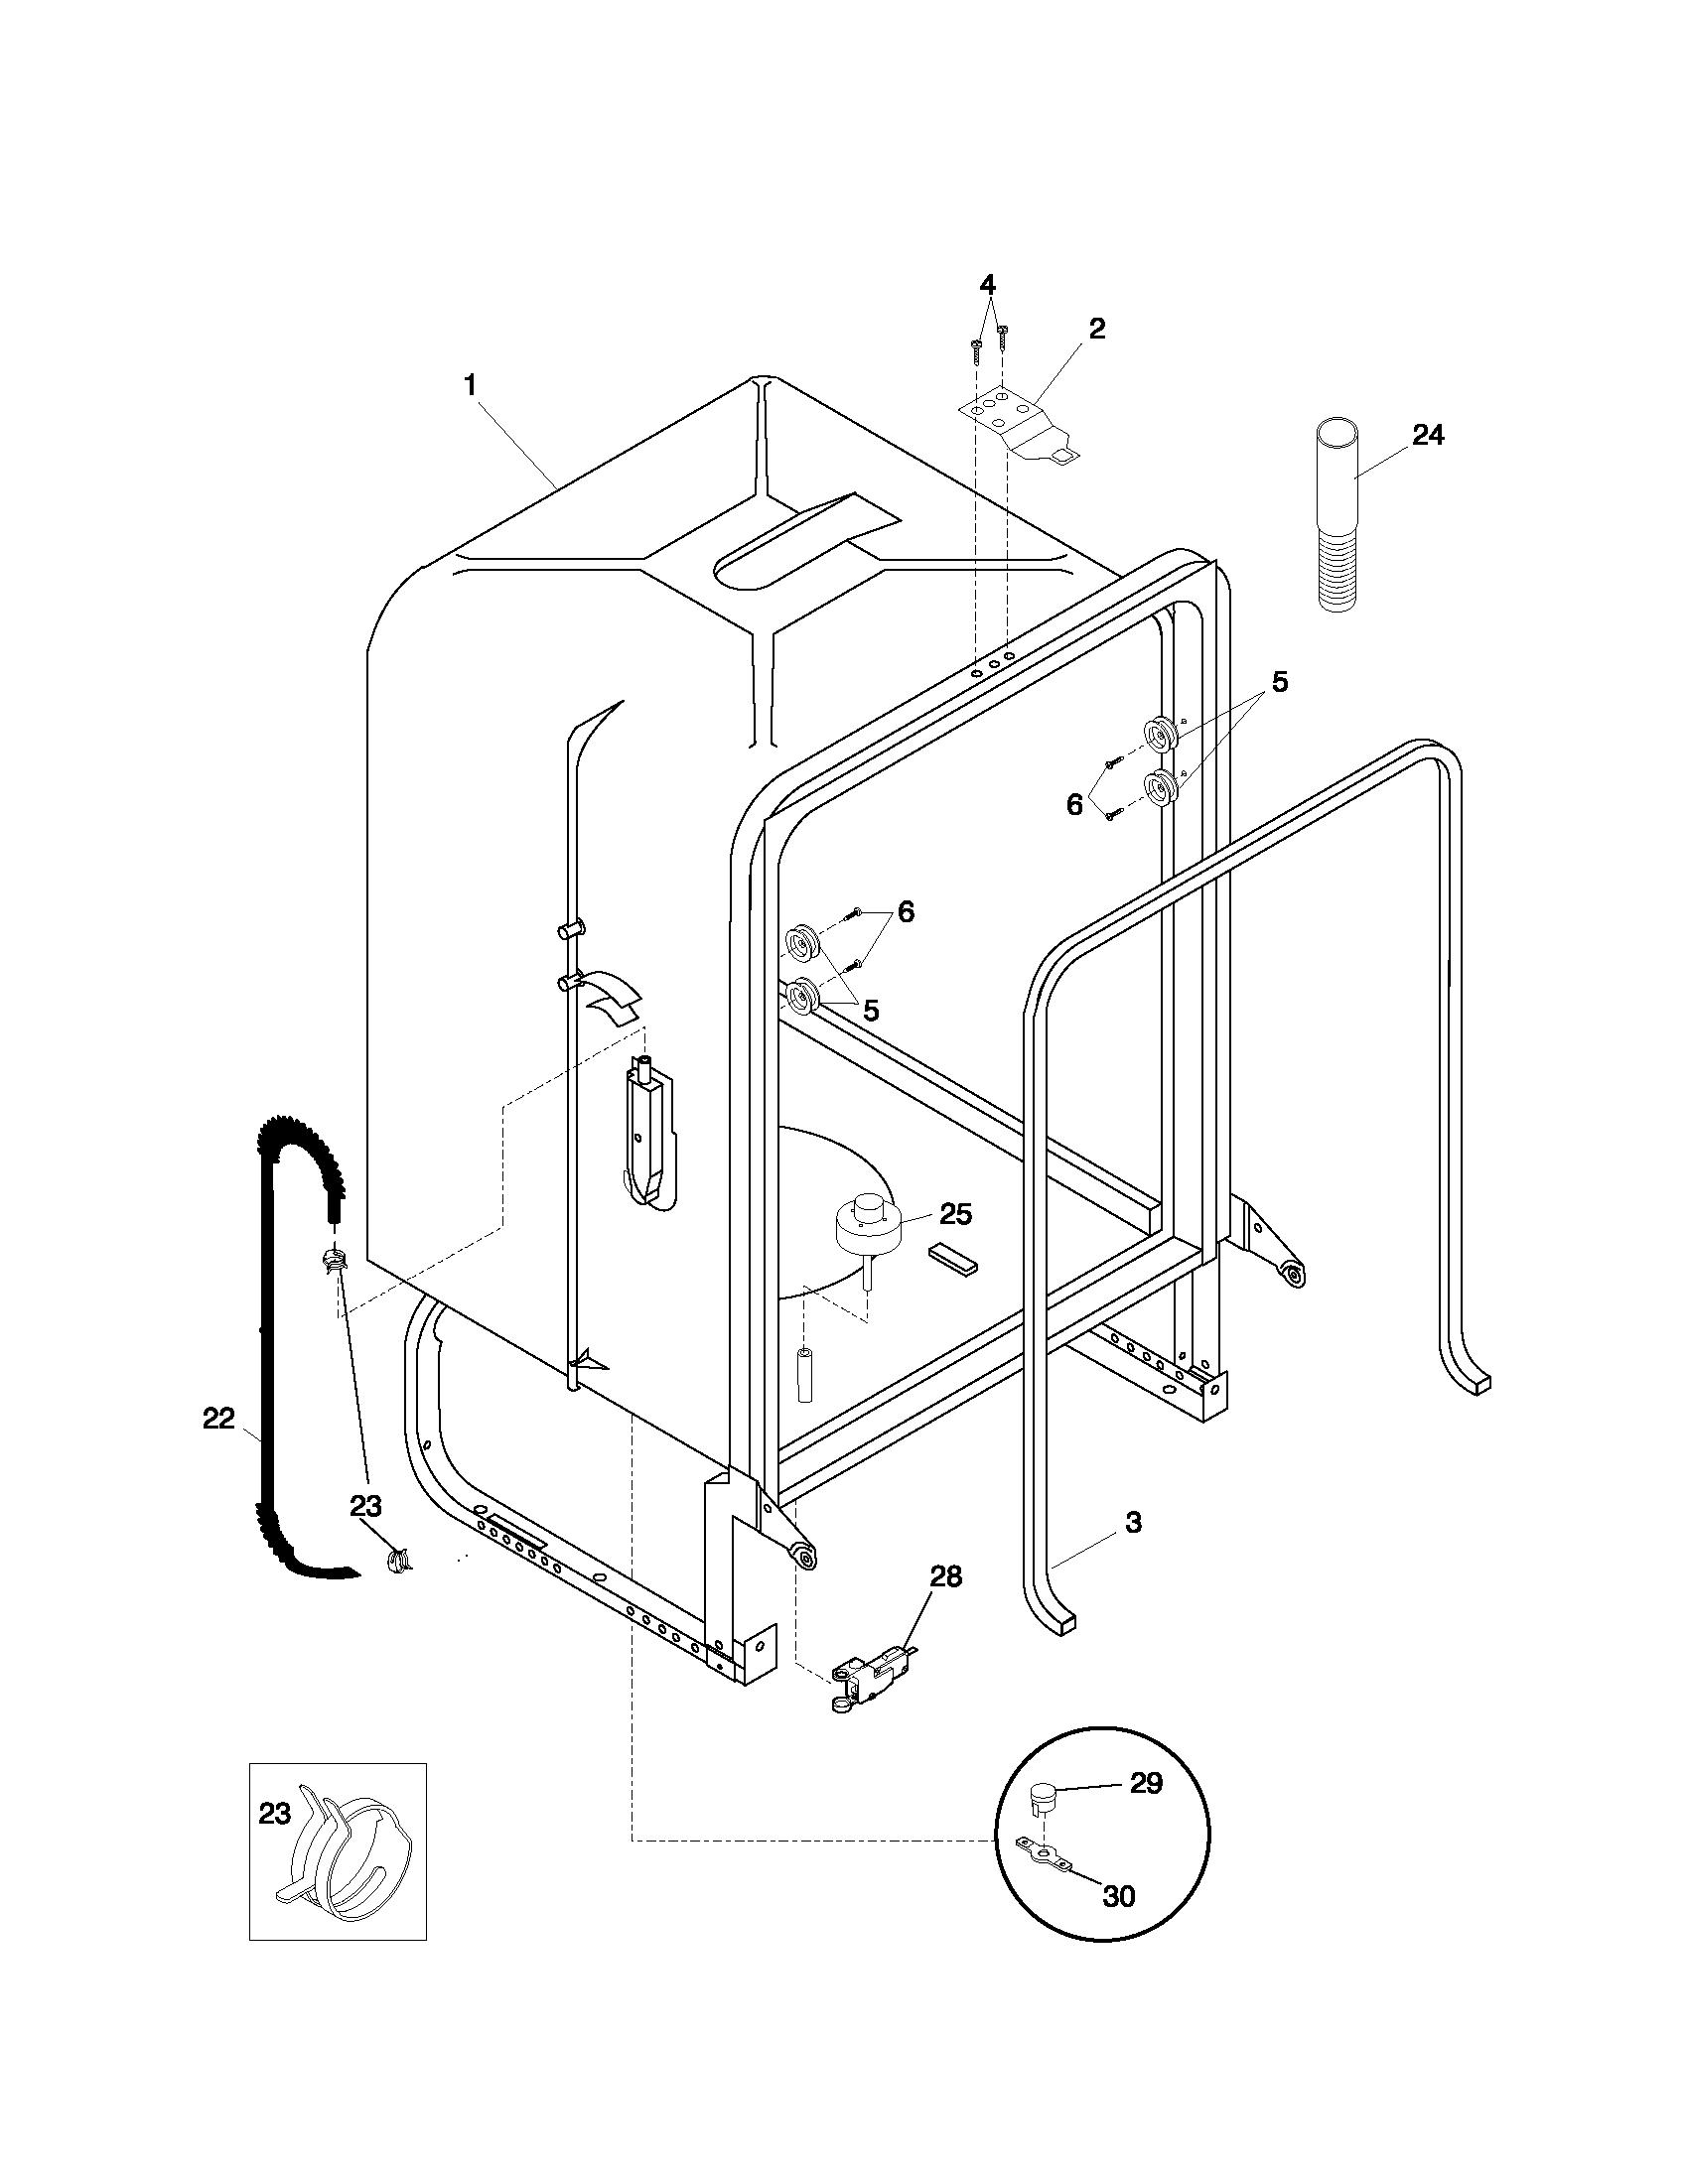 wiring diagram frigidaire fex831fs2 viking kawasaki 2000 prairie, Wiring diagram